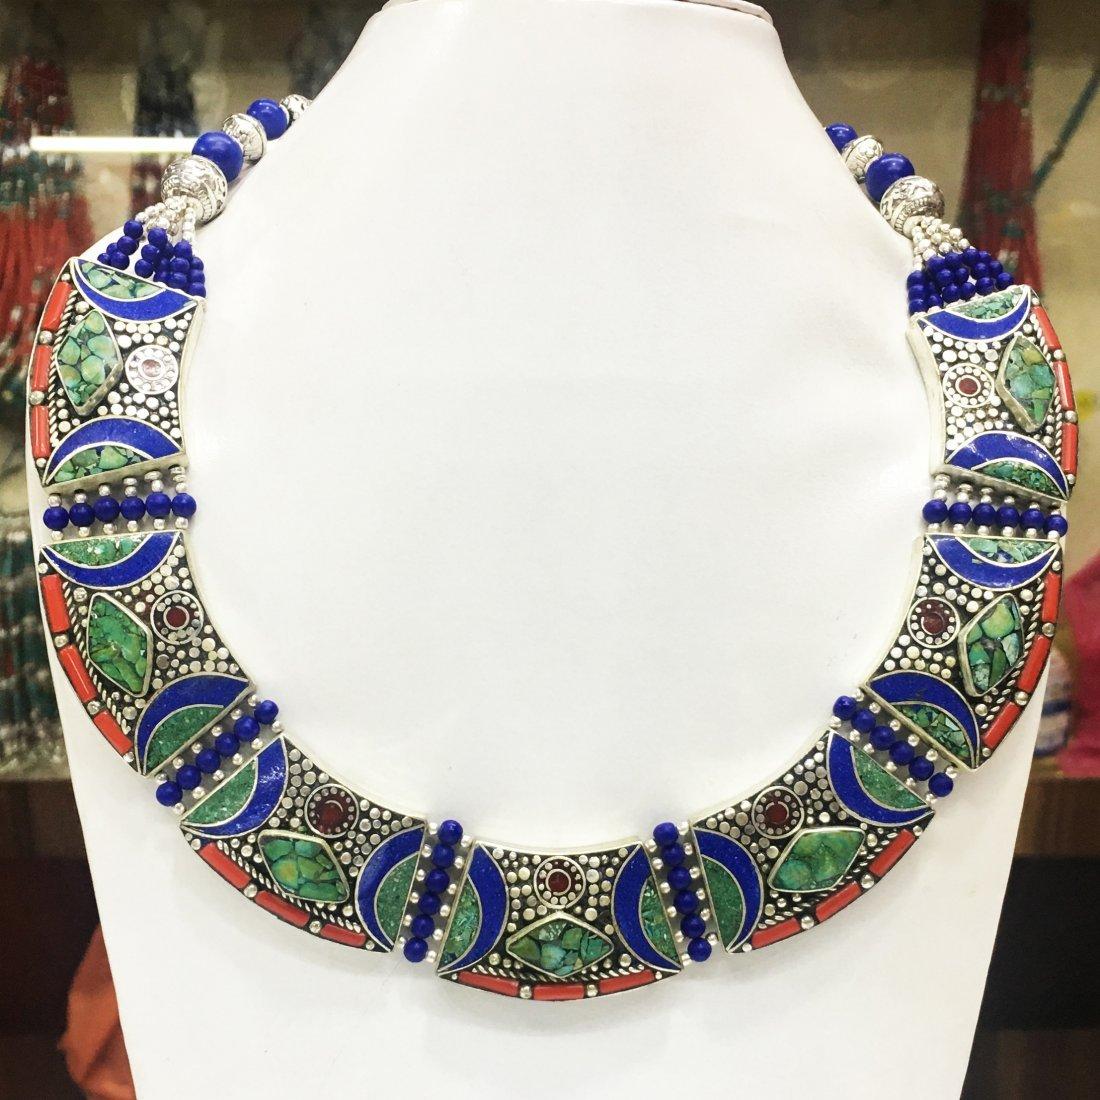 Traditional Tibetan Lapis Lazuli Handmade Necklace